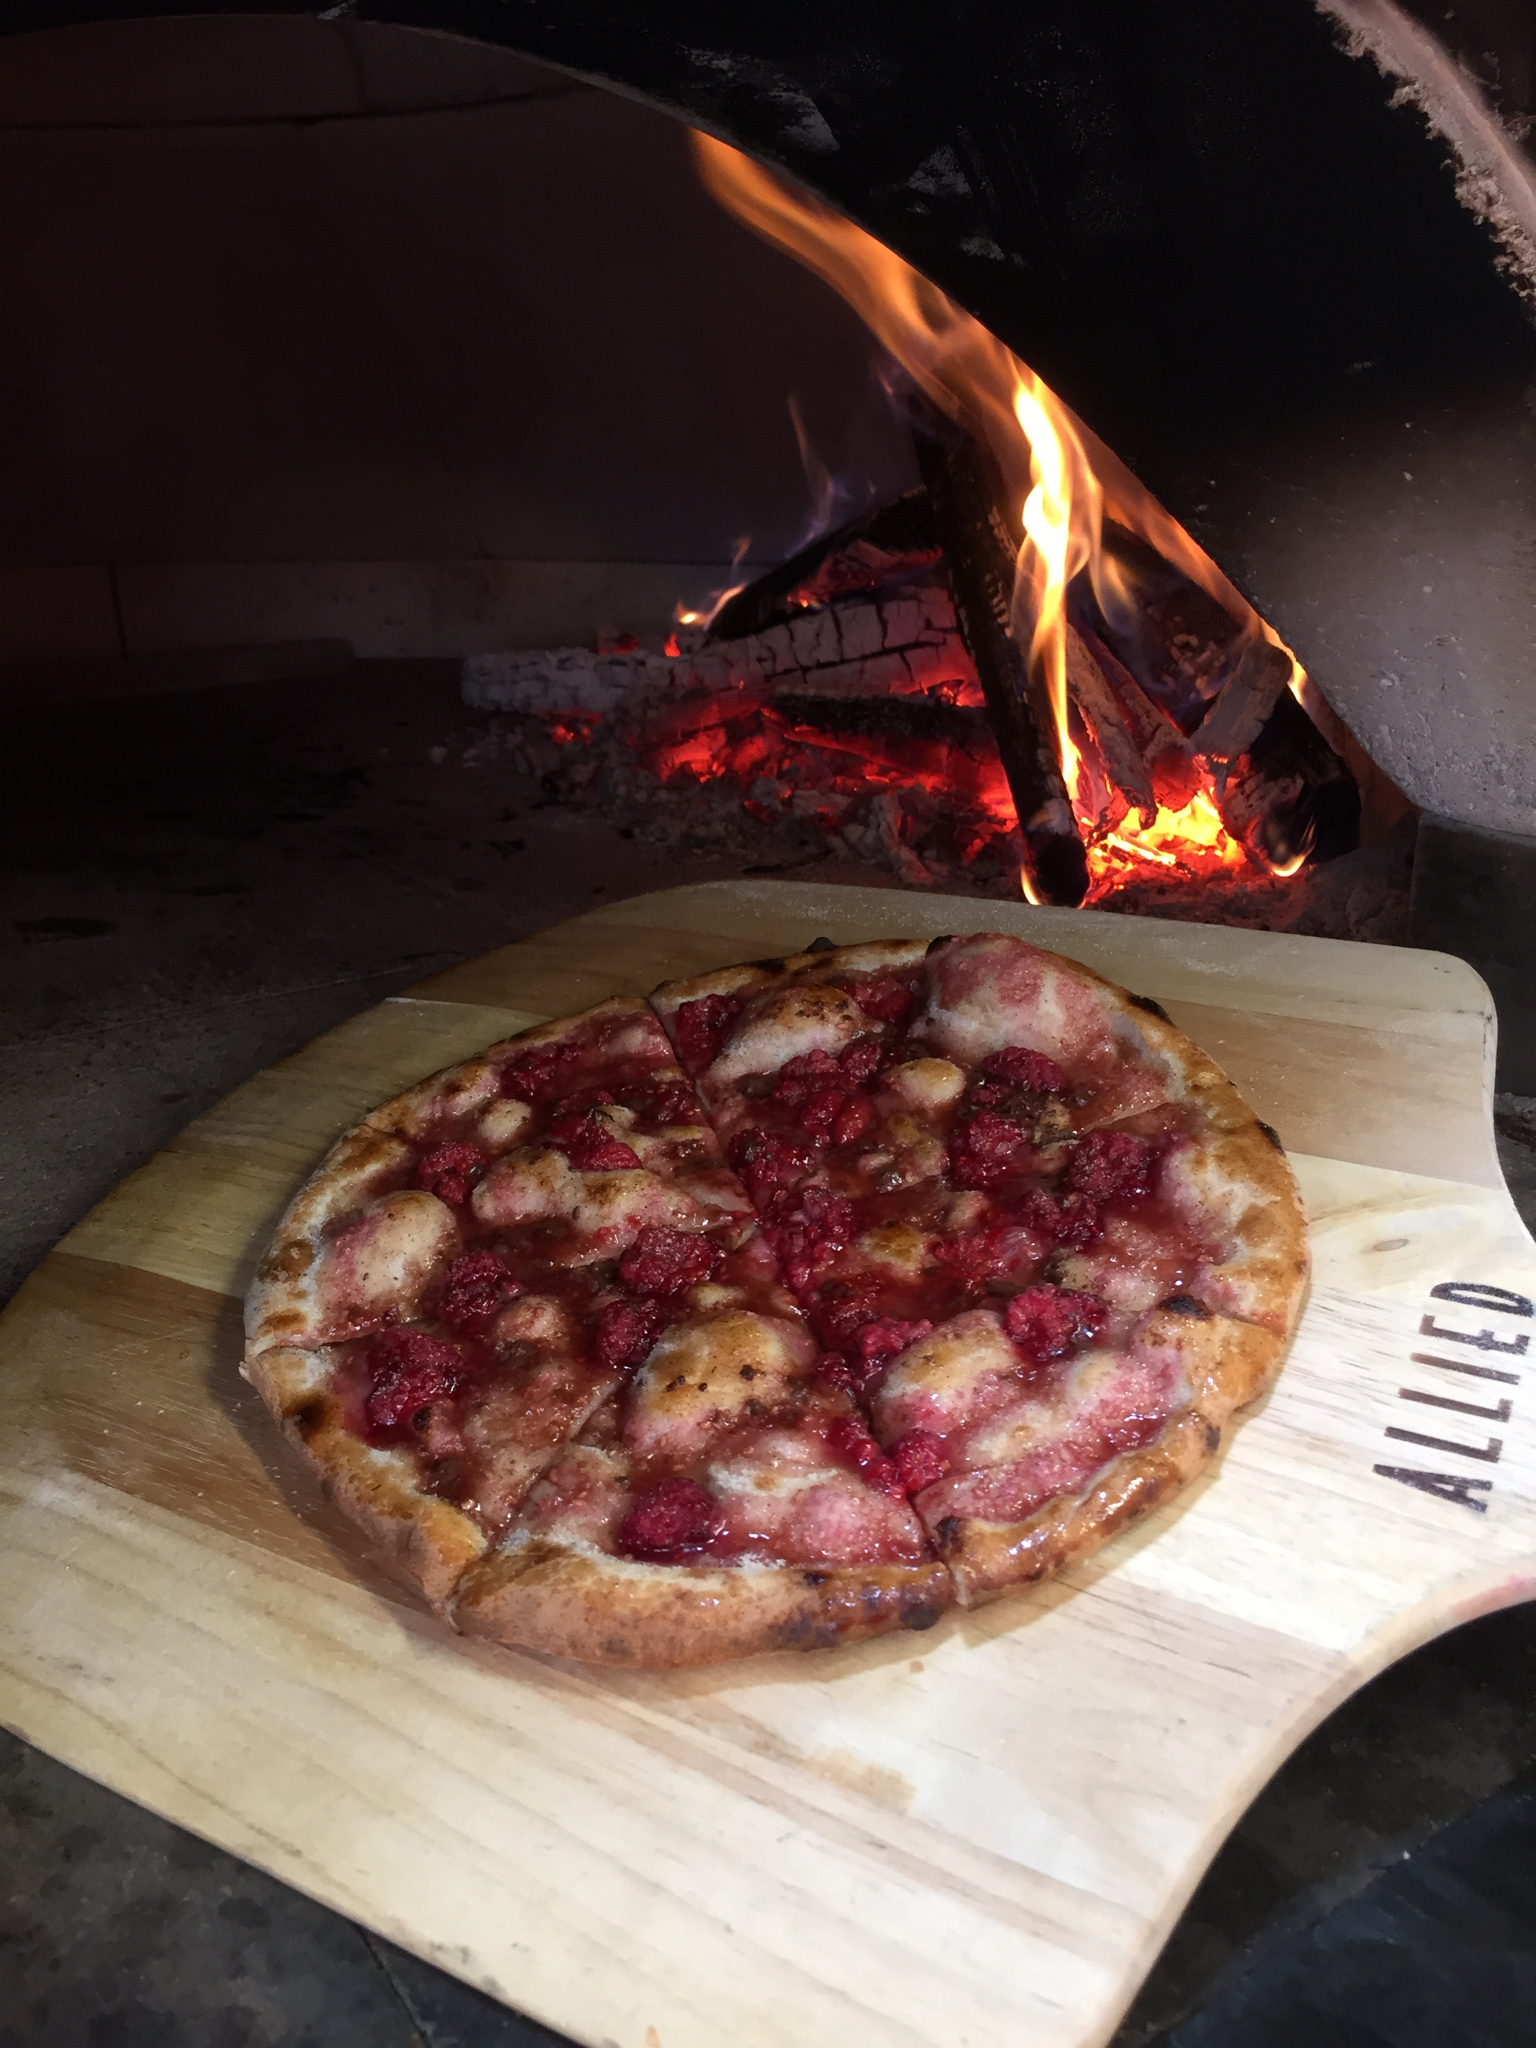 Featuring Fresh Raspberry Mascarpone with Ghirardelli Dark Chocolate